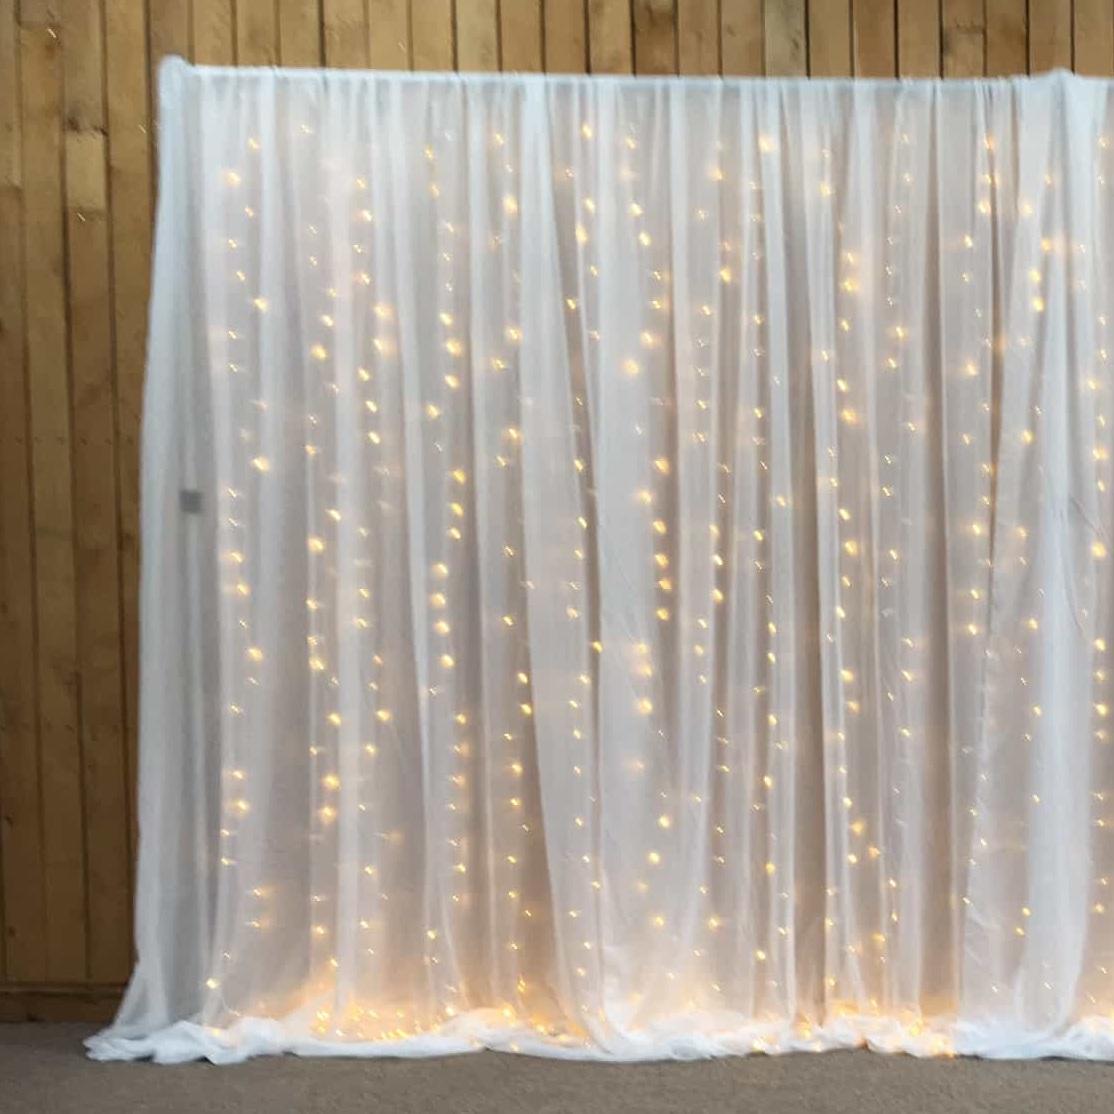 Fairylight-backdrop-close.jpg